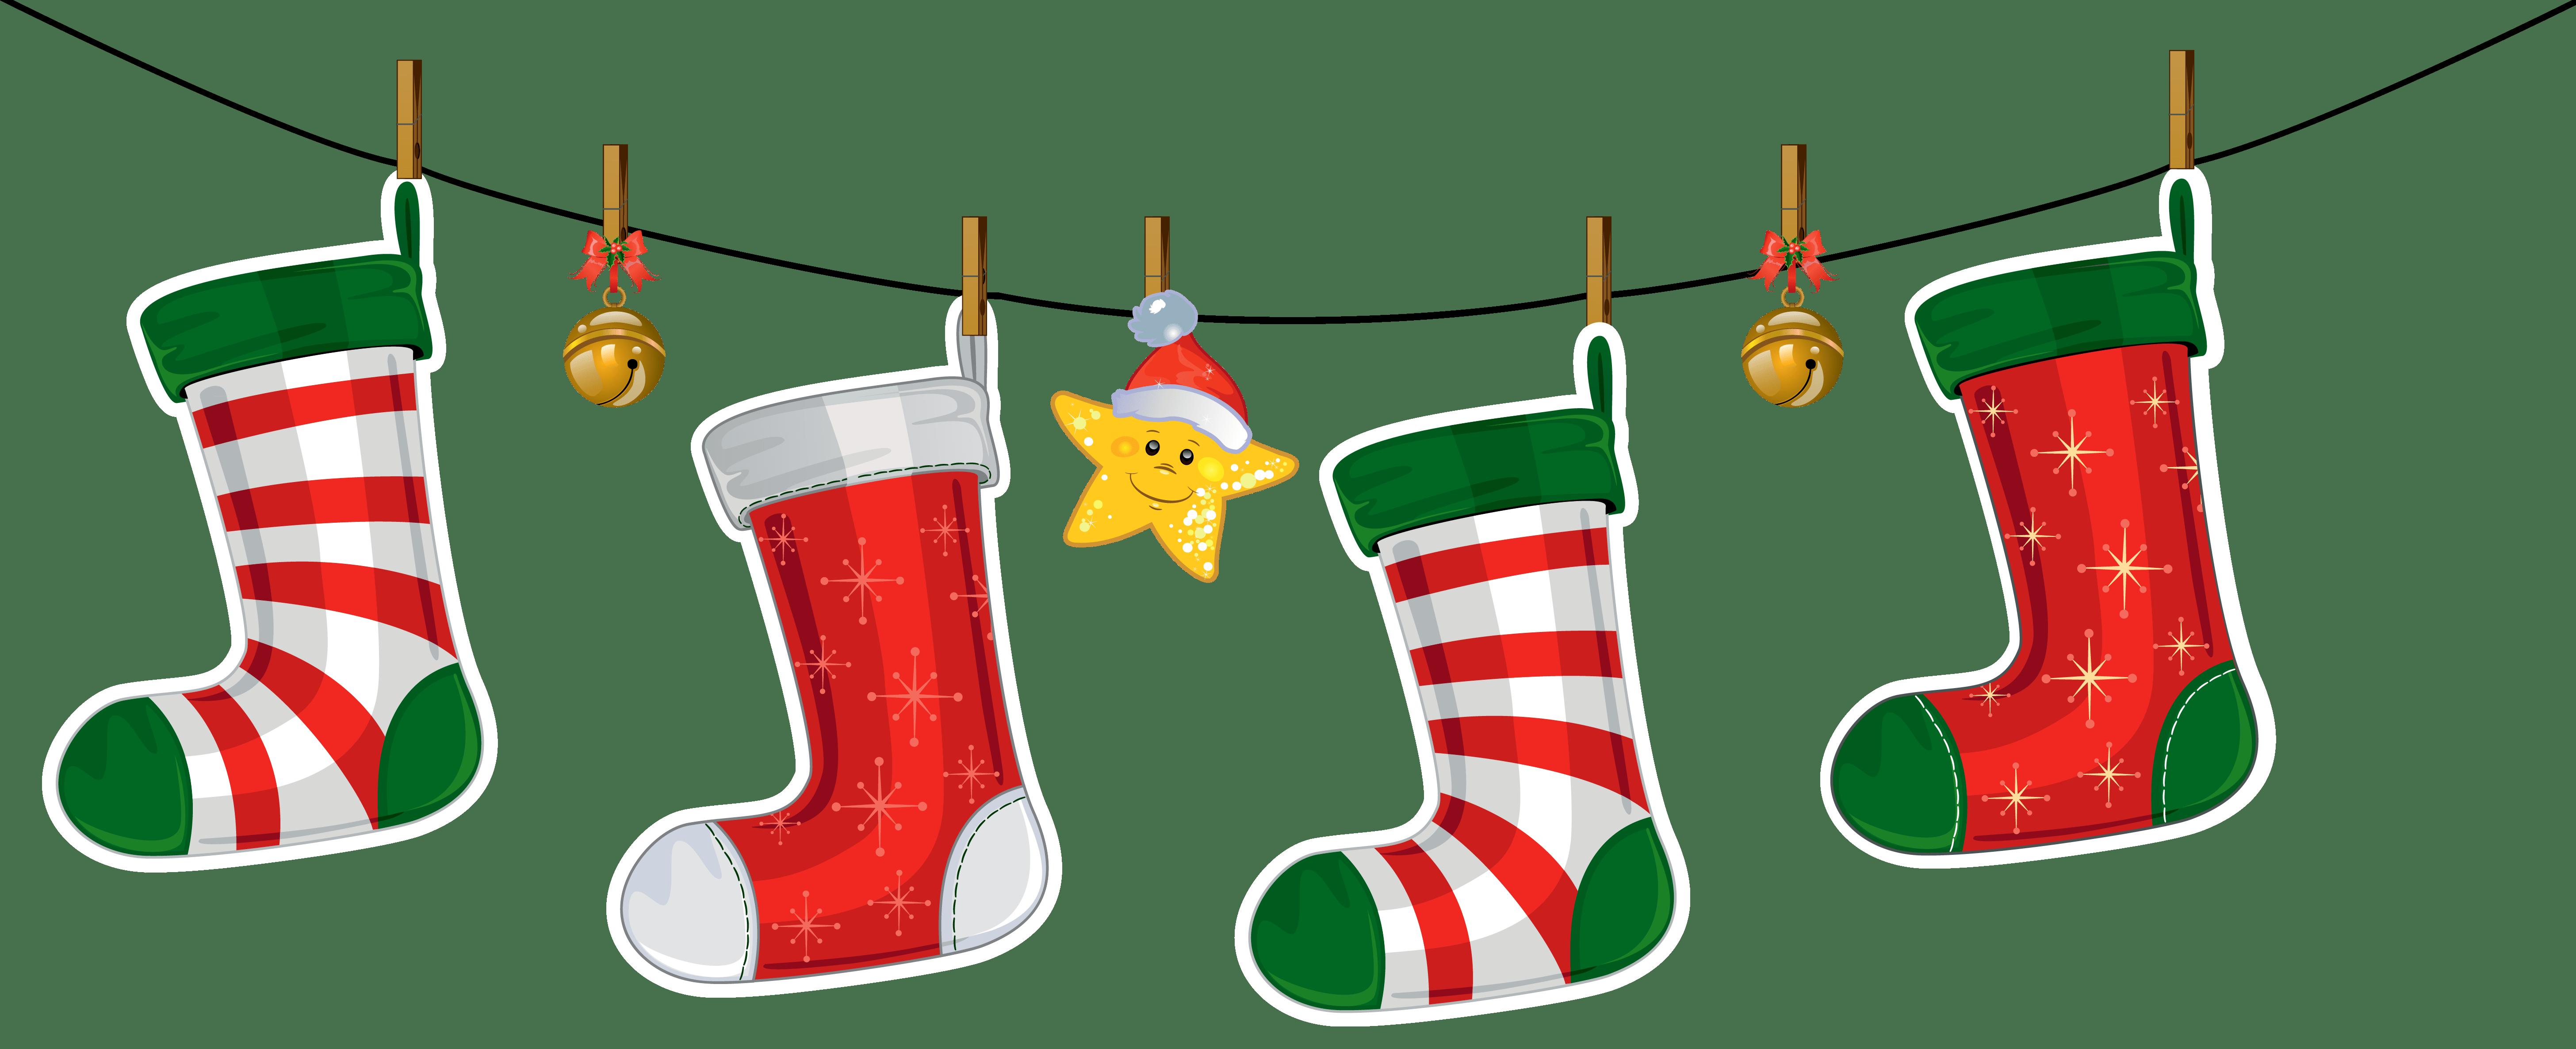 Free christmas stocking at. Elf clipart socks